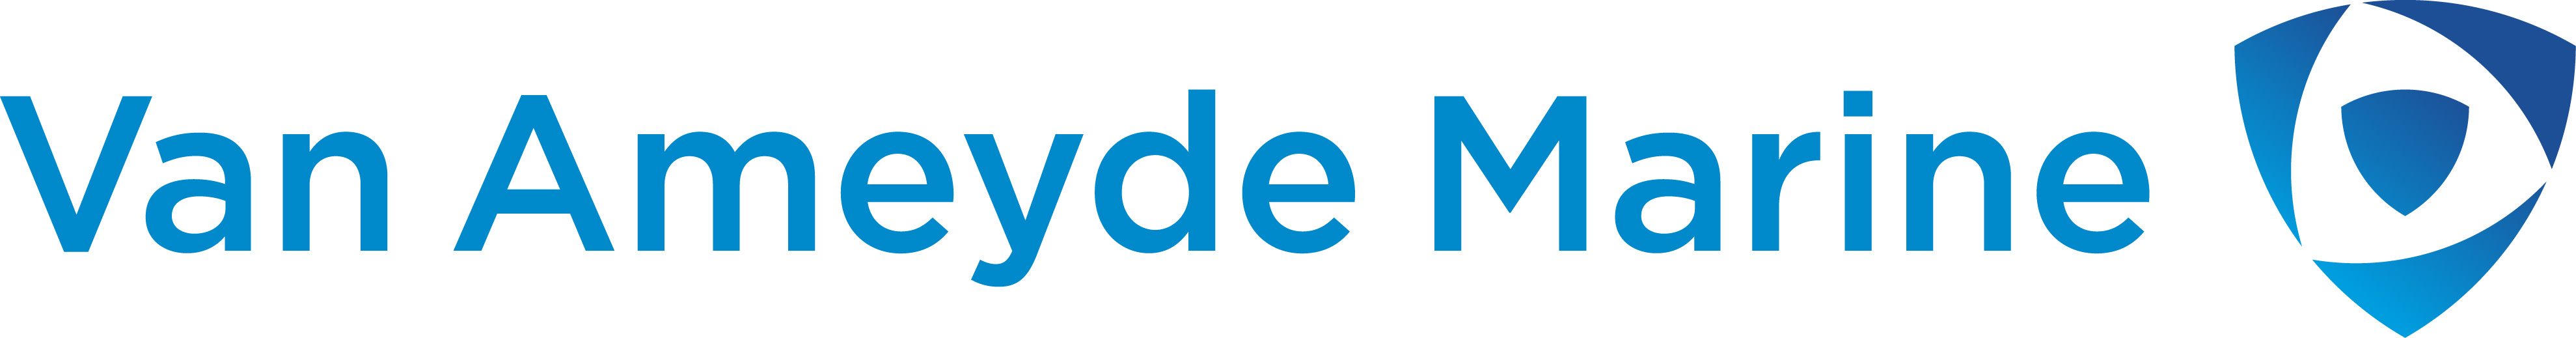 Van Ameyde Marine - Logo RGB